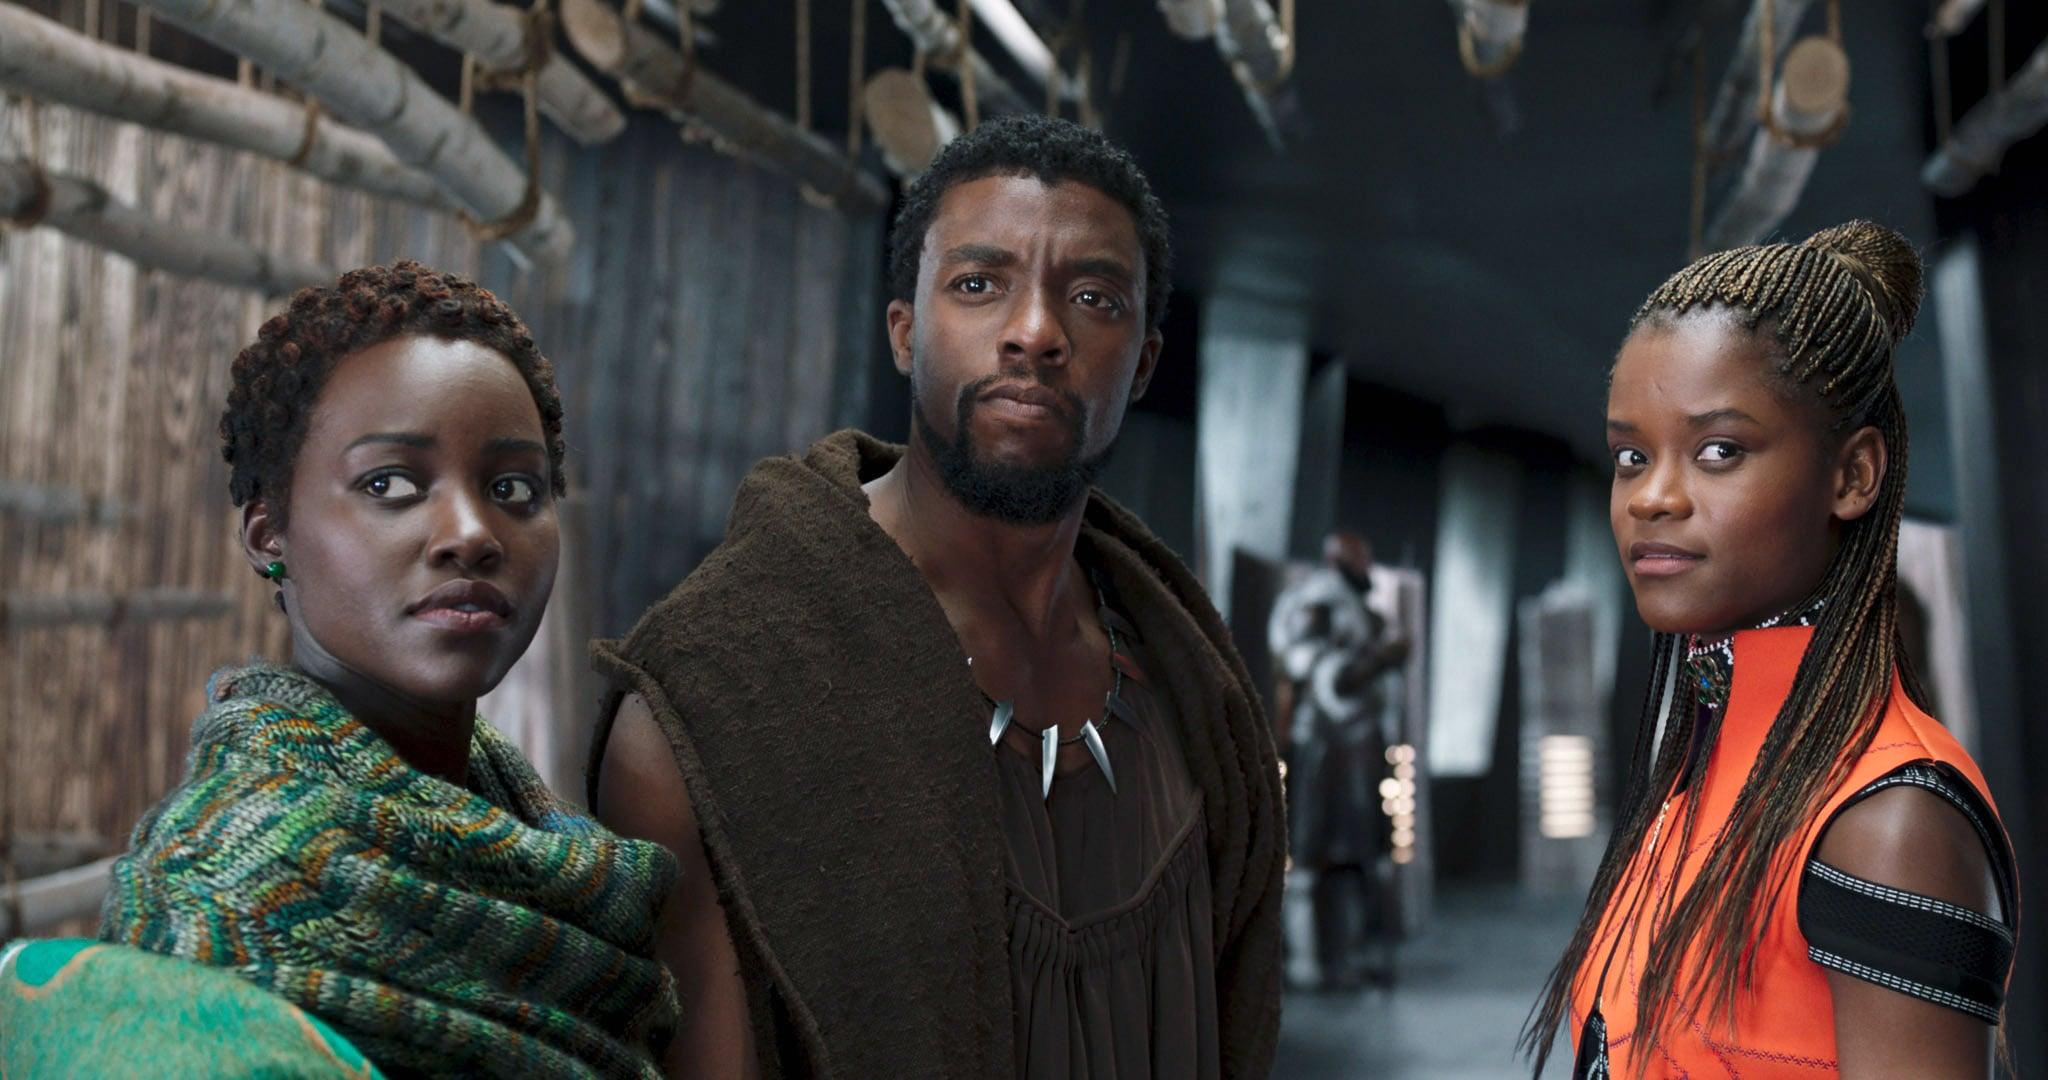 BLACK PANTHER ، از سمت چپ: Lupita Nyongo ، Chadwick Boseman ، Letitia Wright، 2018. Marvel / Walt Disney Studios Motion Pictures / حسن نیت ارائه می دهد مجموعه اورت